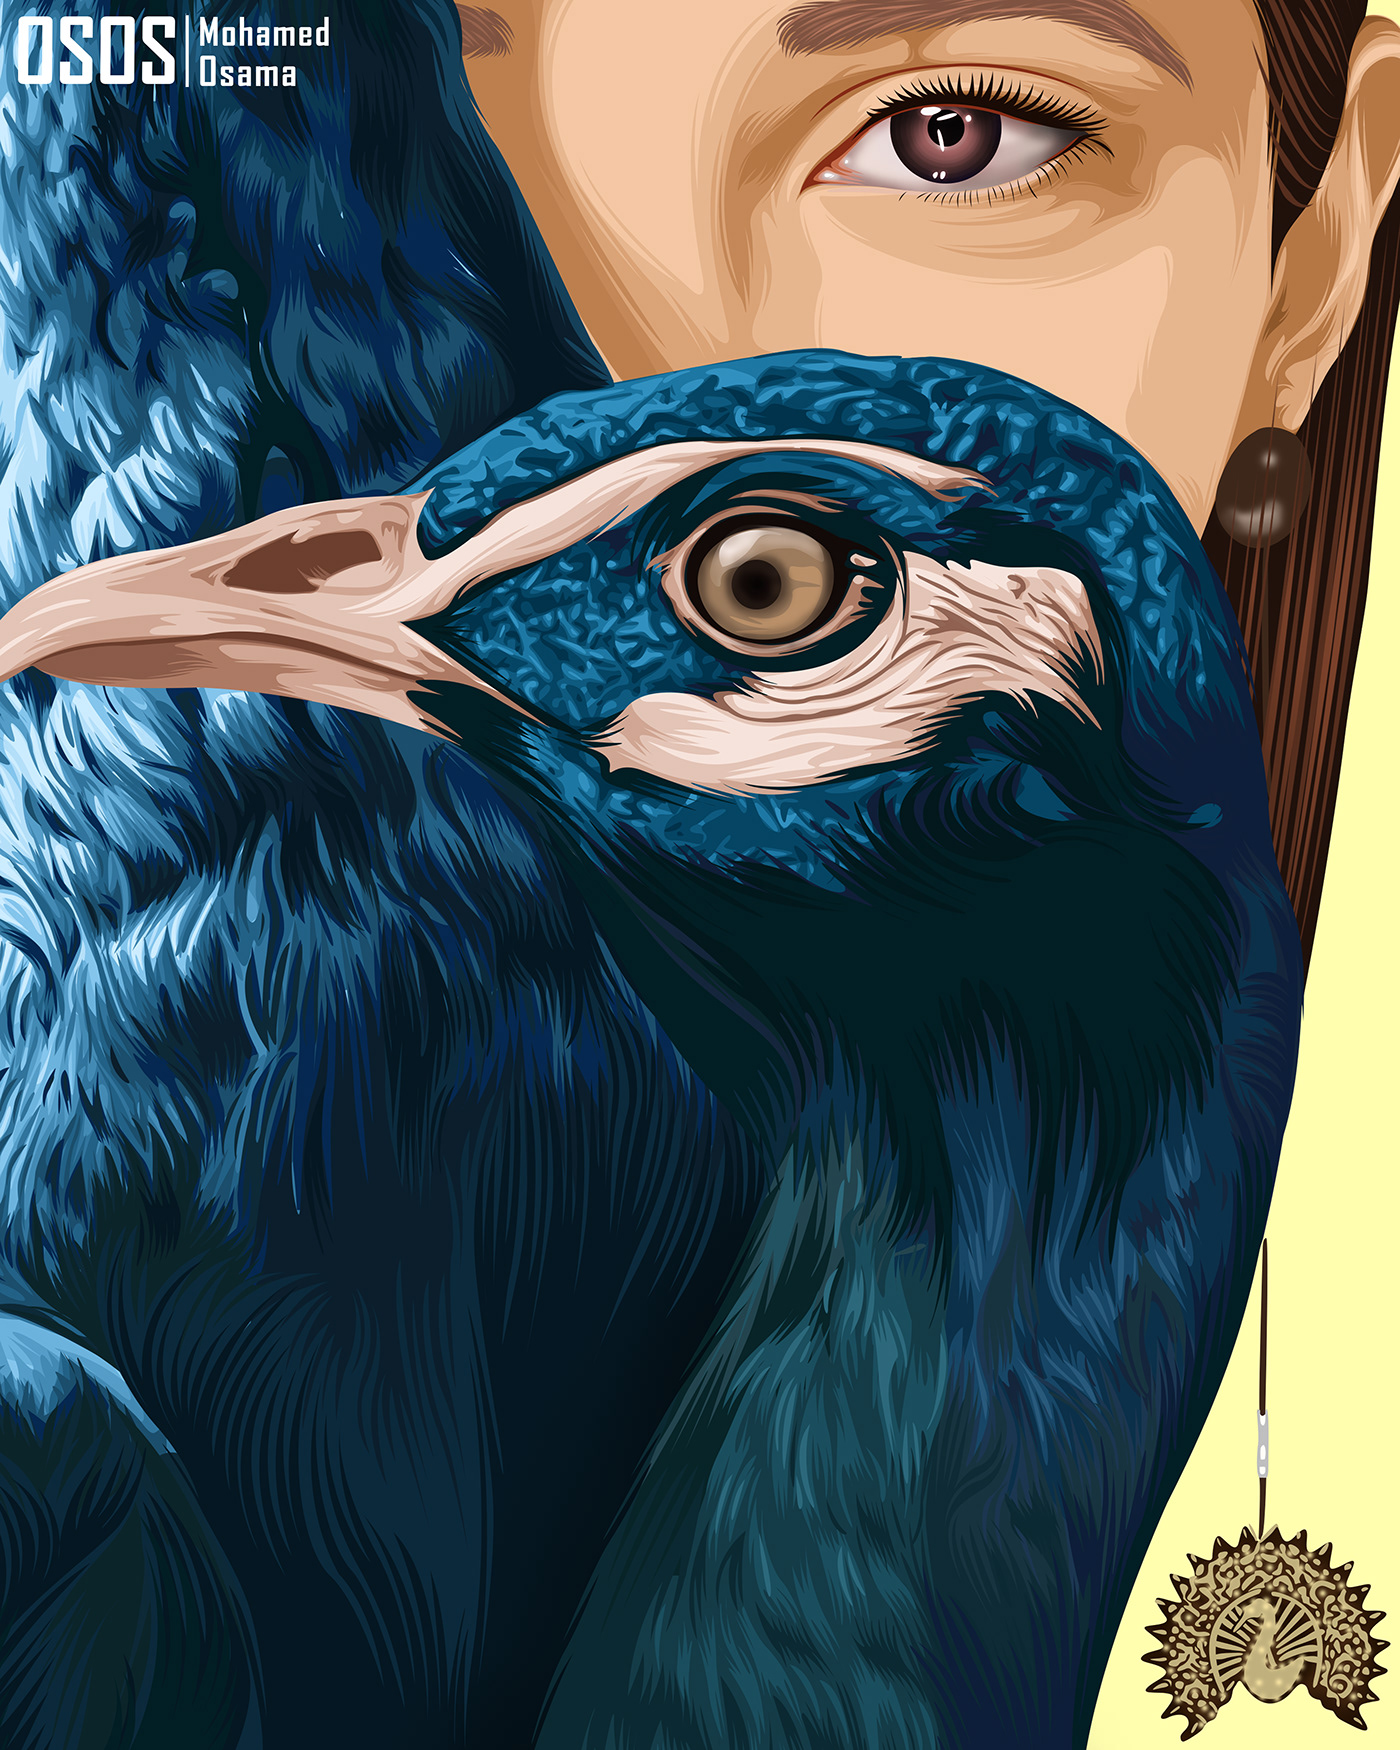 Image may contain: bird, animal and art